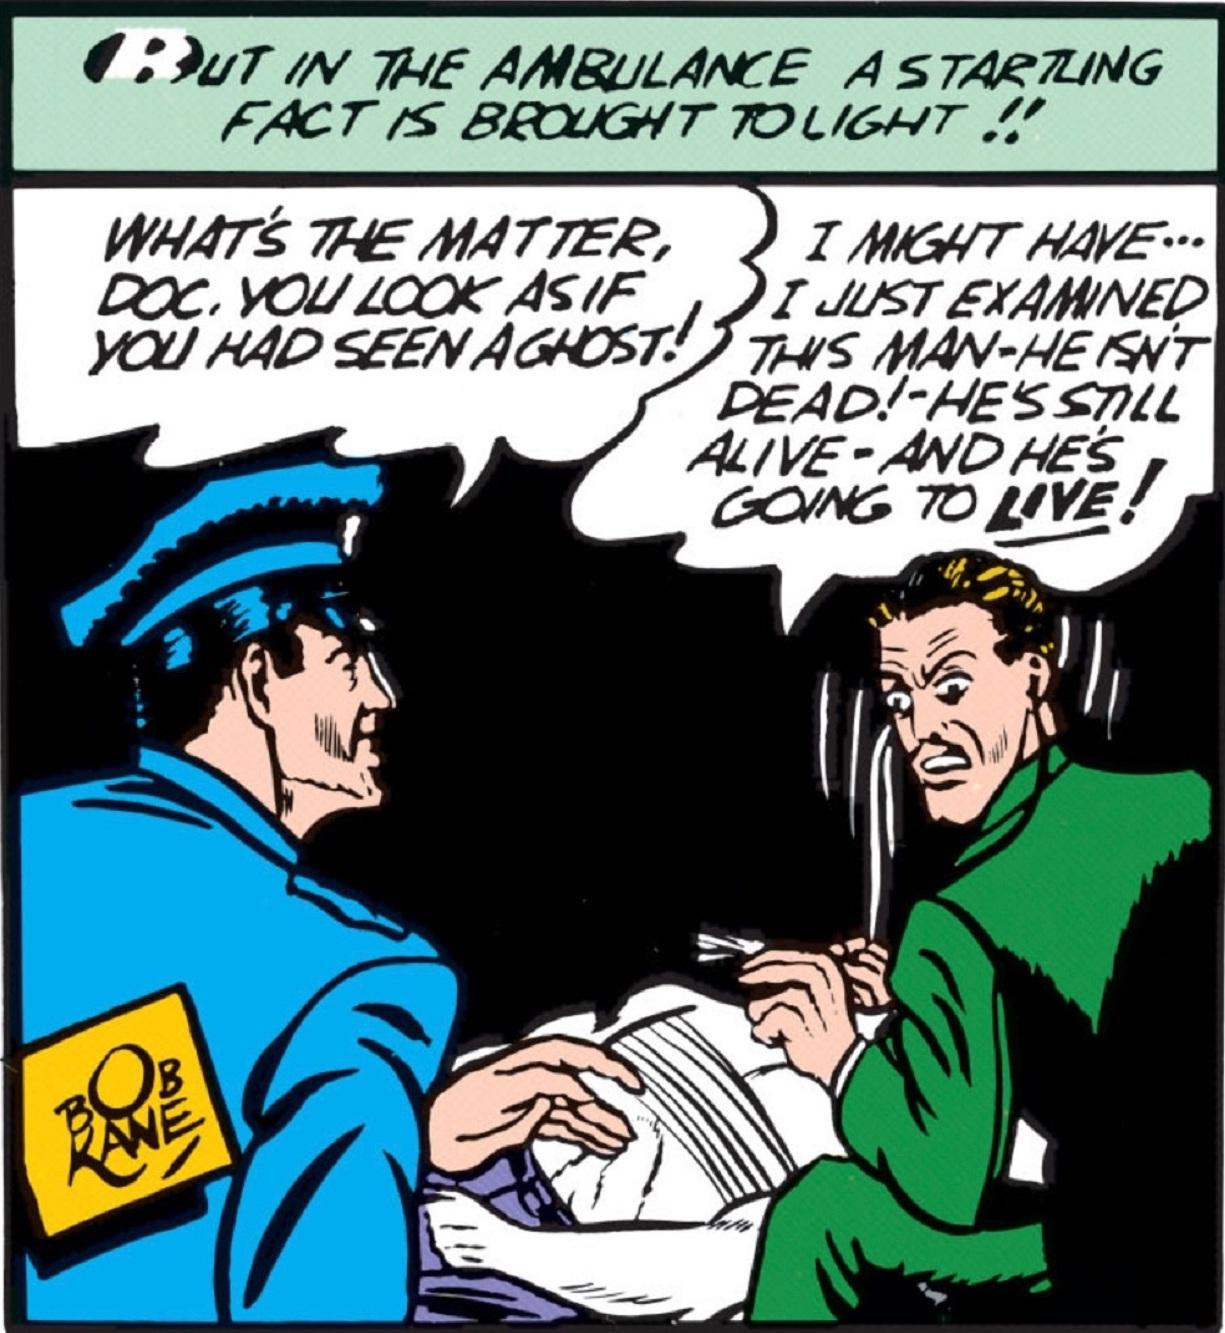 Batman 1 2nd story ending.JPG